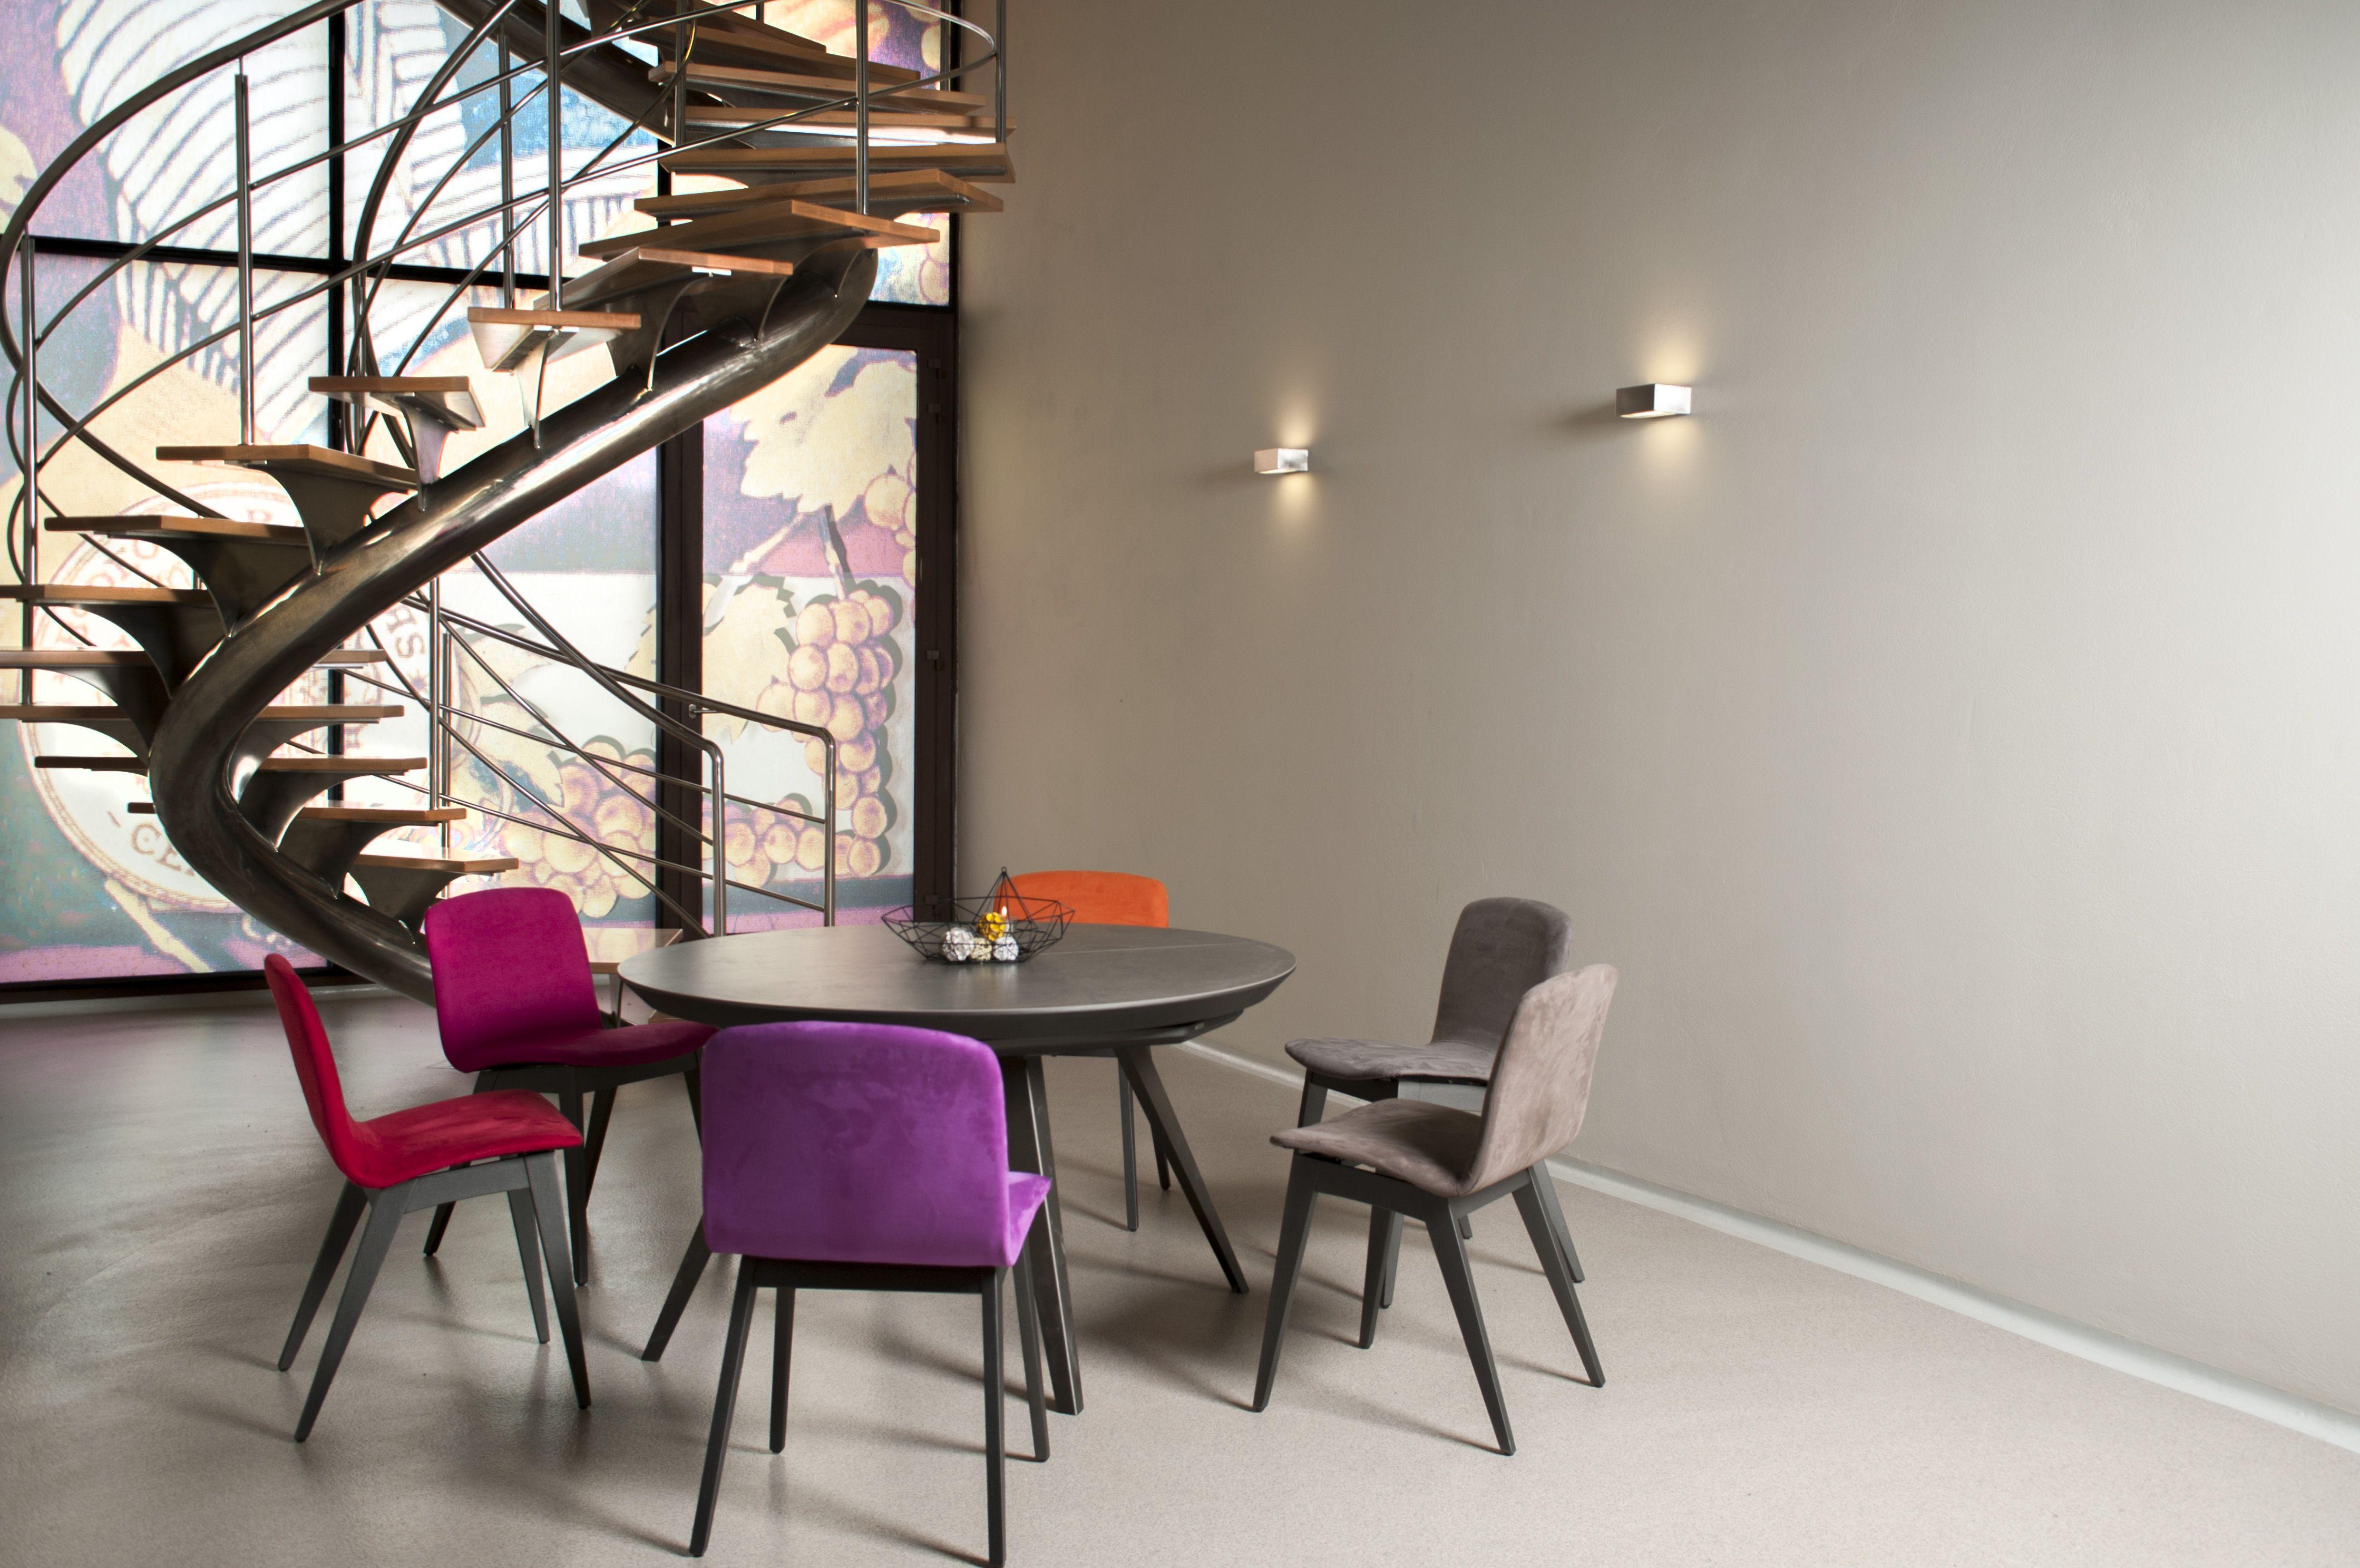 Alia Table By Discalsa Design Furniture Pinterest # Muebles Lara Paterna